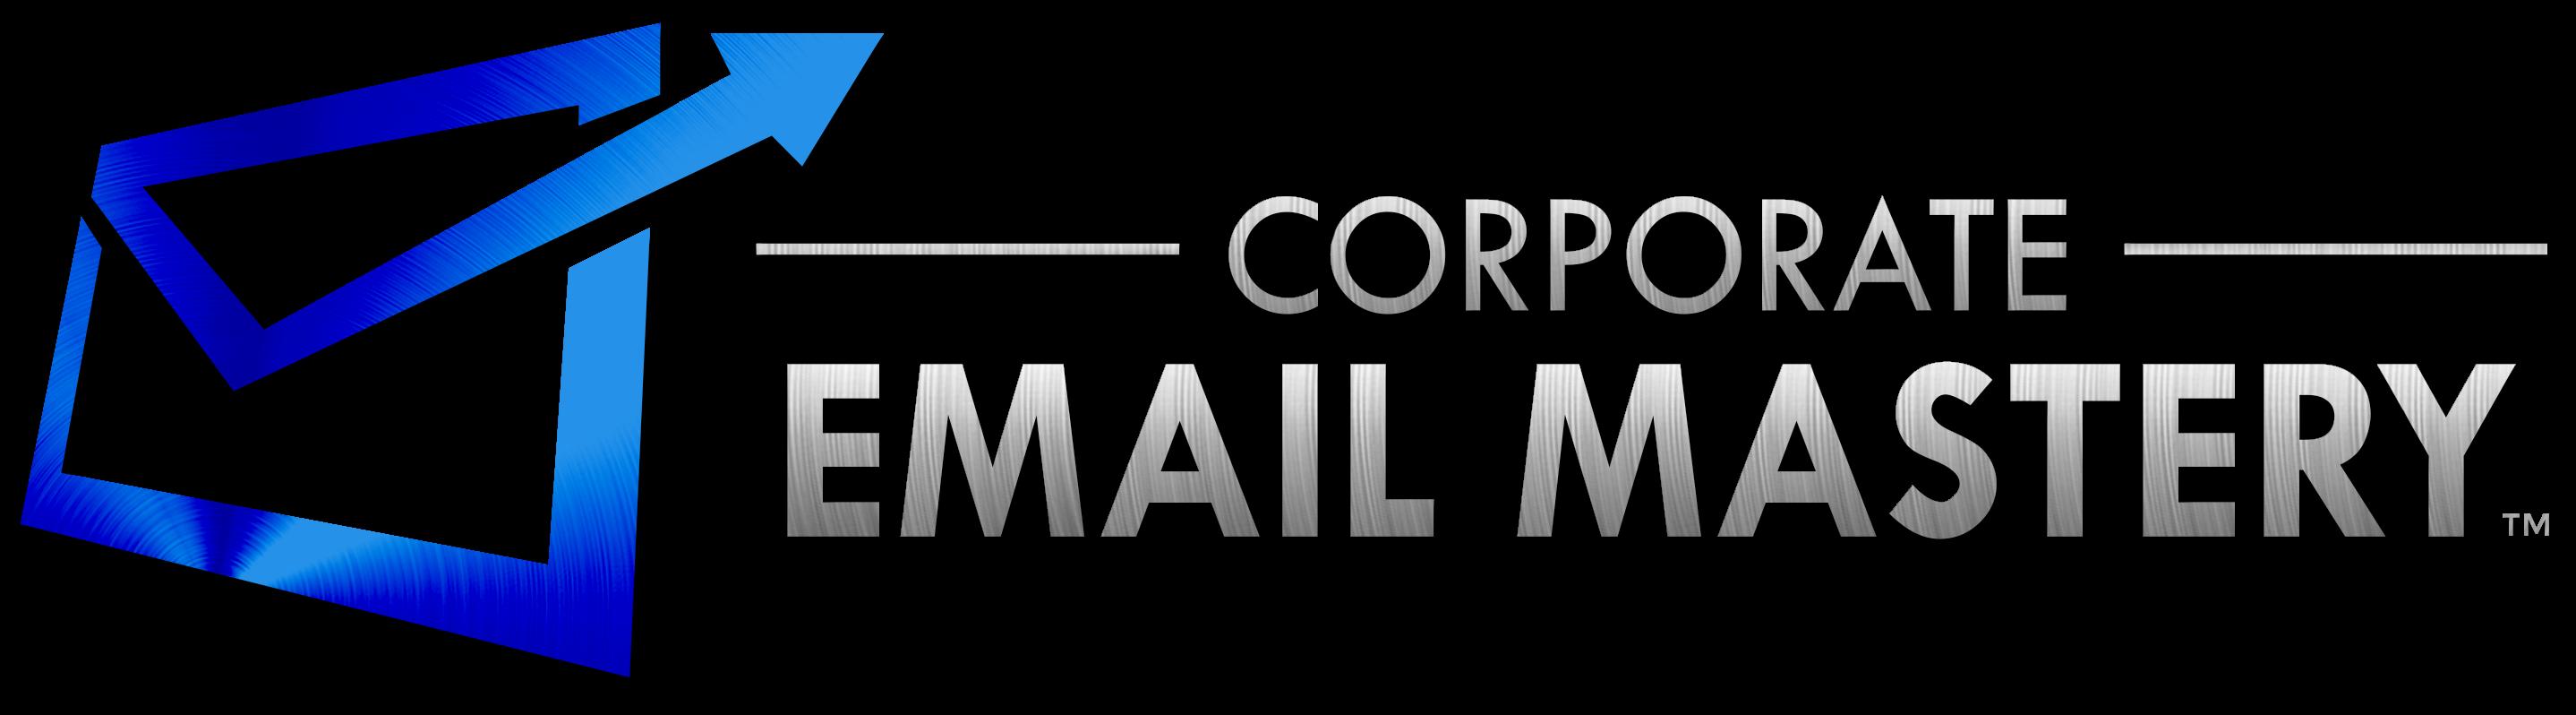 2018_08_31-Corporate-Email-Mastery-Logo-Horizontal